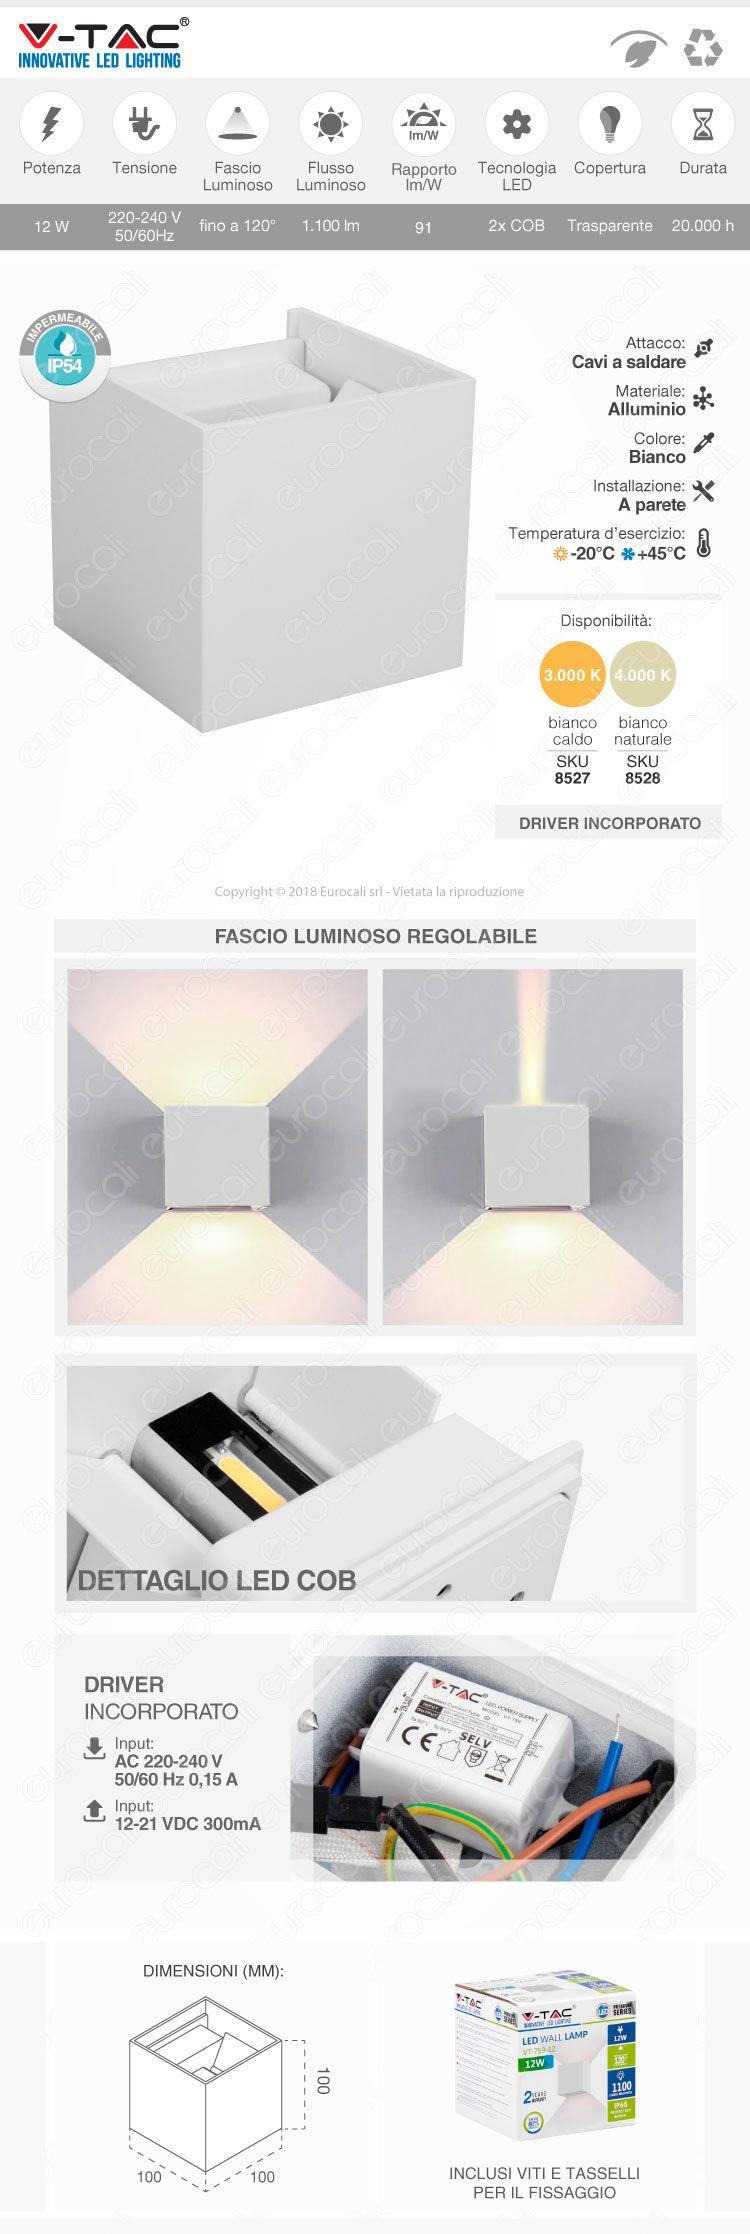 V-Tac VT-759-12 Lampada da Muro Wall Light Bianca con Doppio LED COB 12W